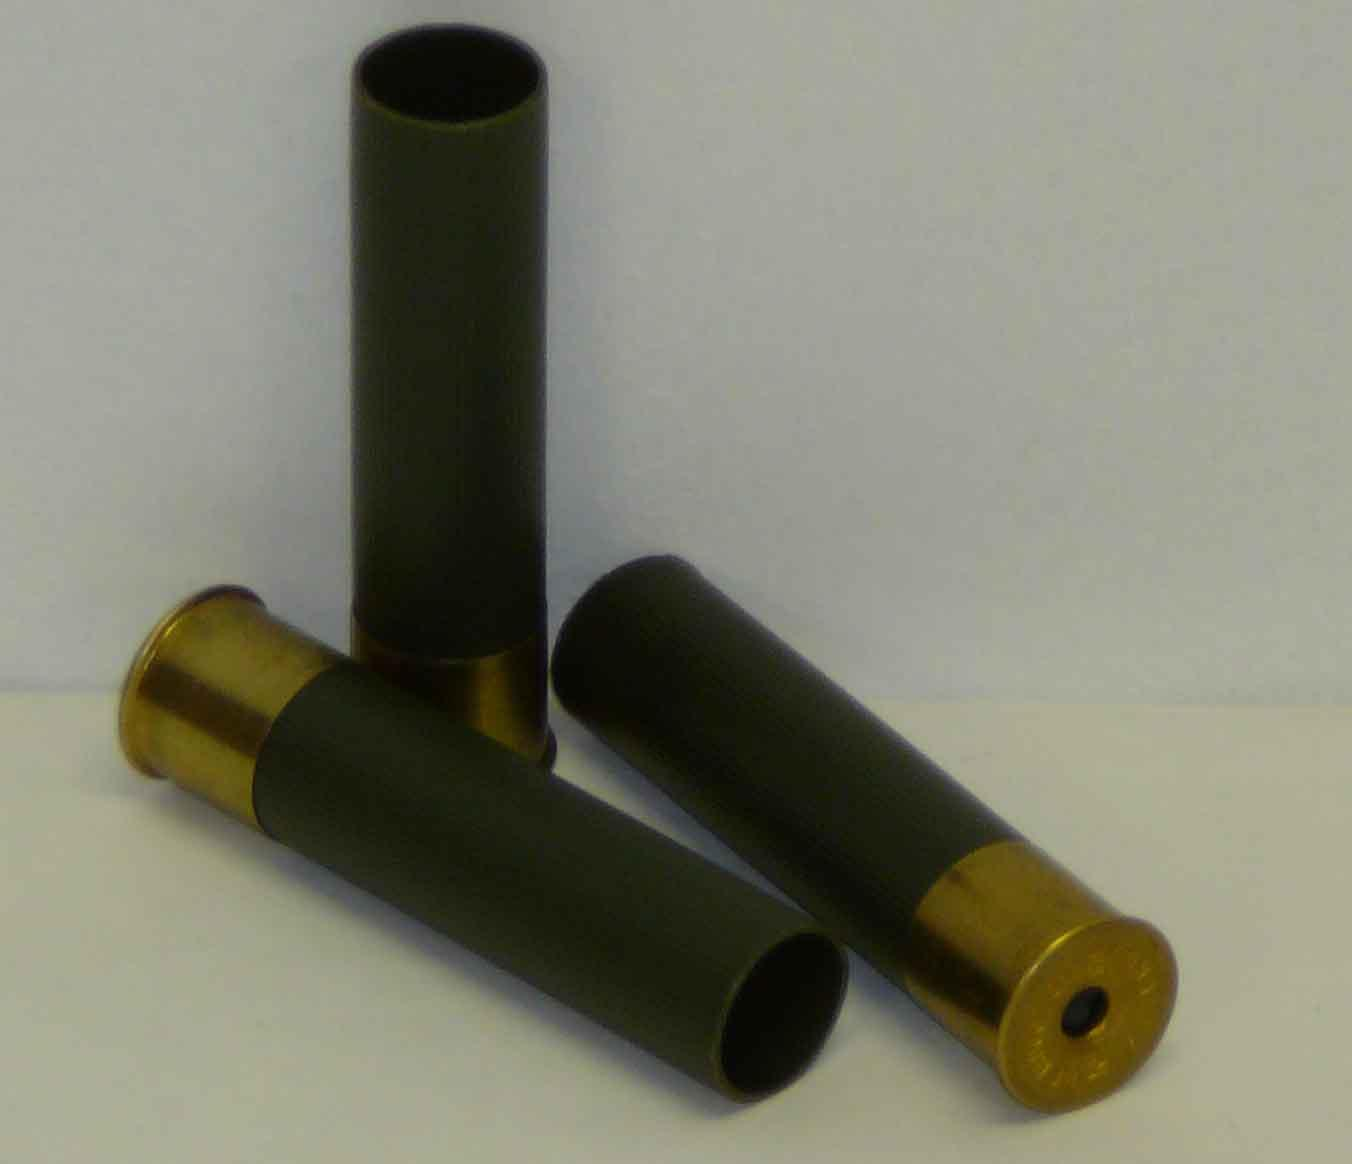 Remington 10/89 -hylsy, uusi 100kpl